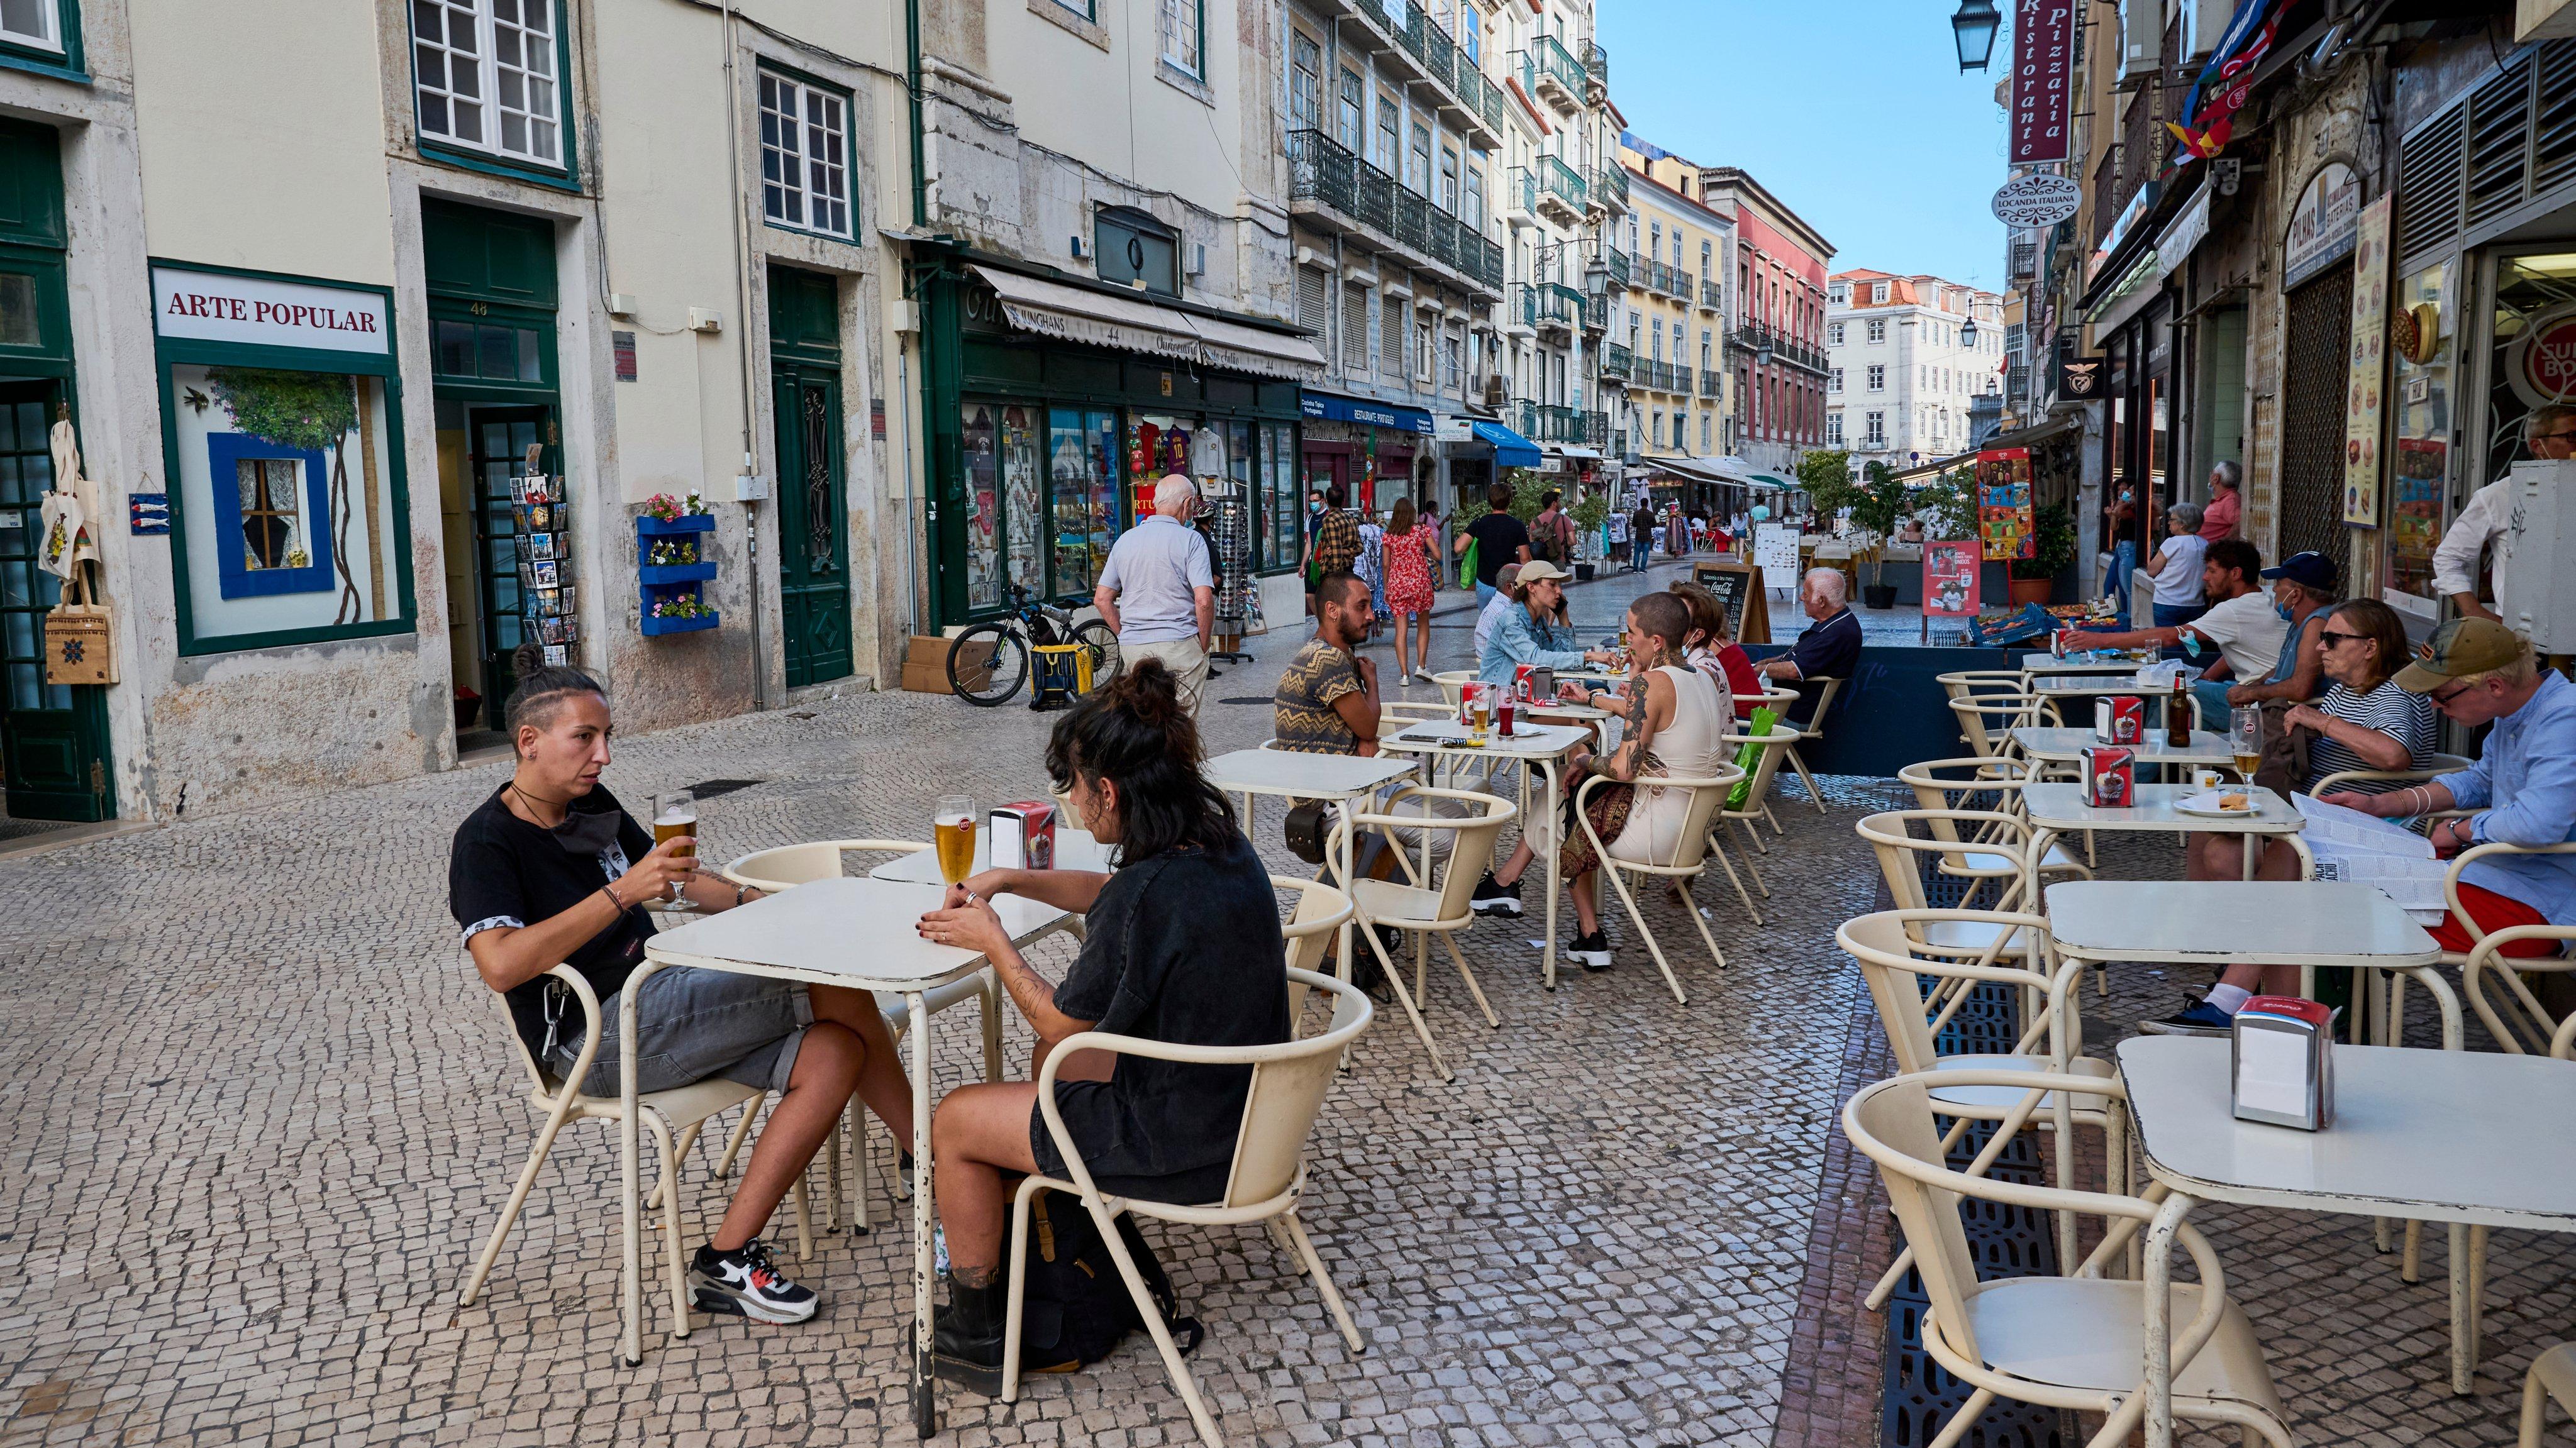 Lisbon Tourism Picks Up As COVID-19 Vaccination Continue